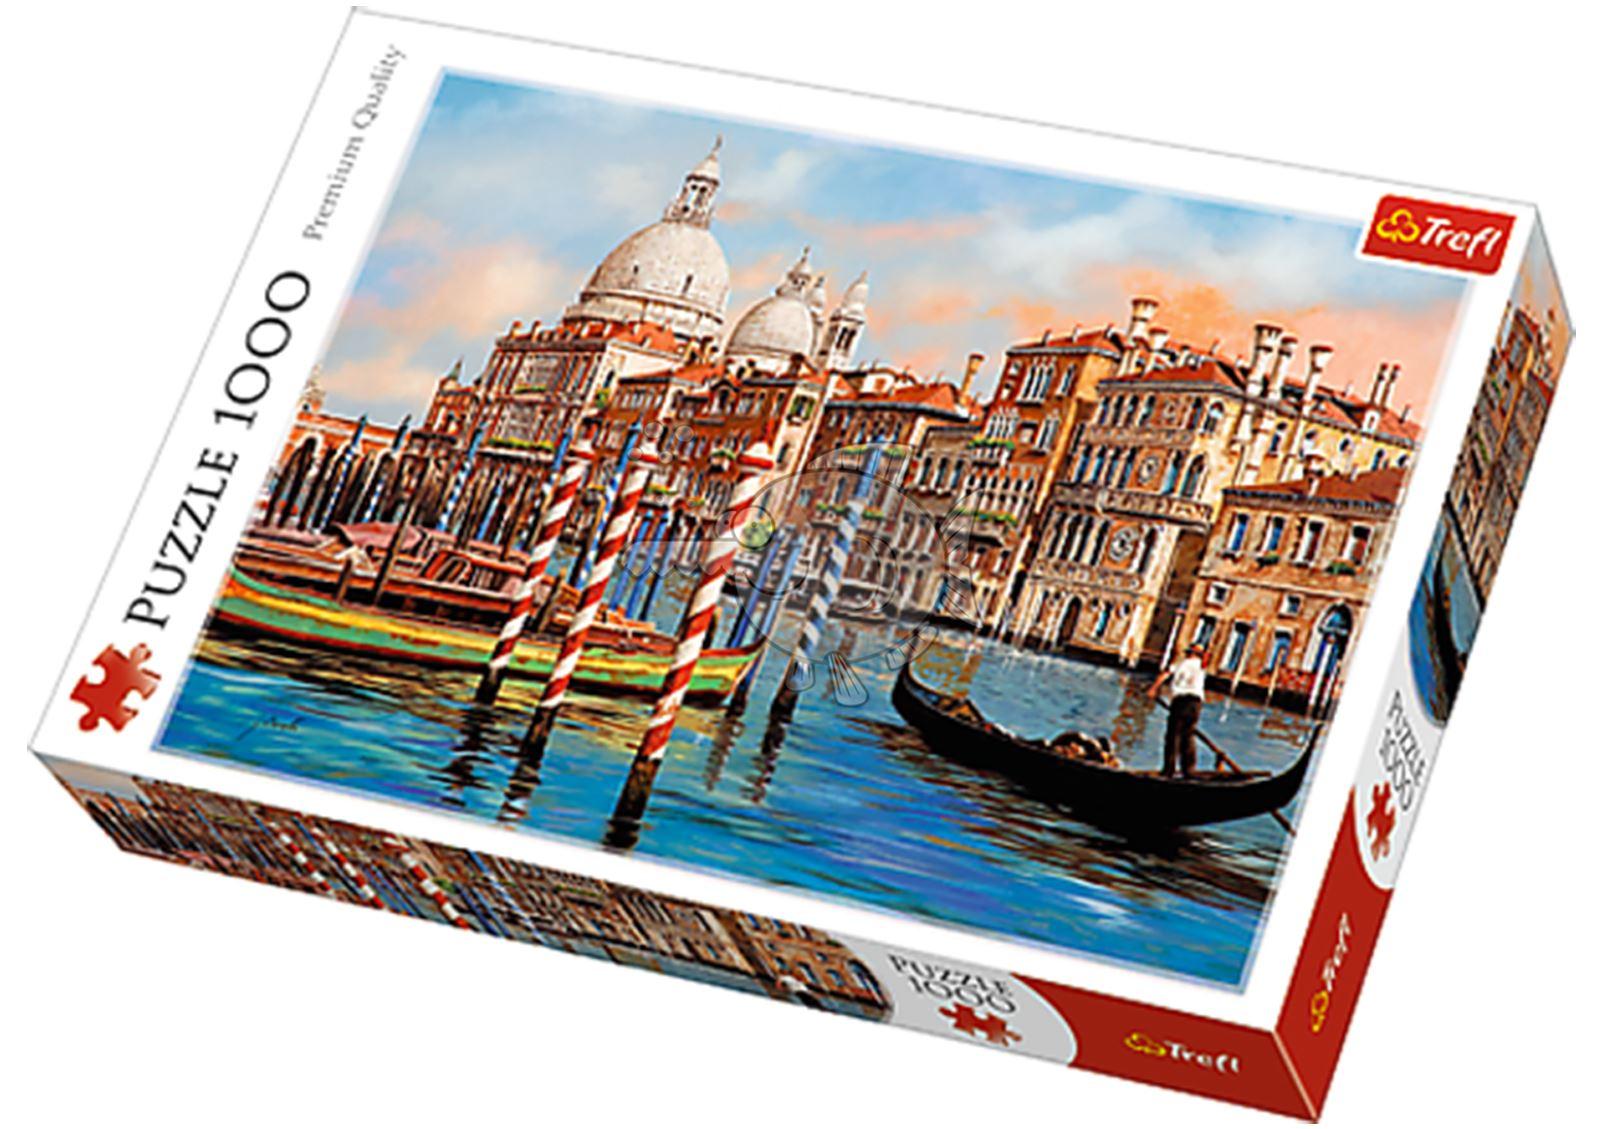 Trefl-300-500-1000-1500-2000-3000-4000-6000-Piece-Jigsaw-Puzzle-Landscapes-City thumbnail 432